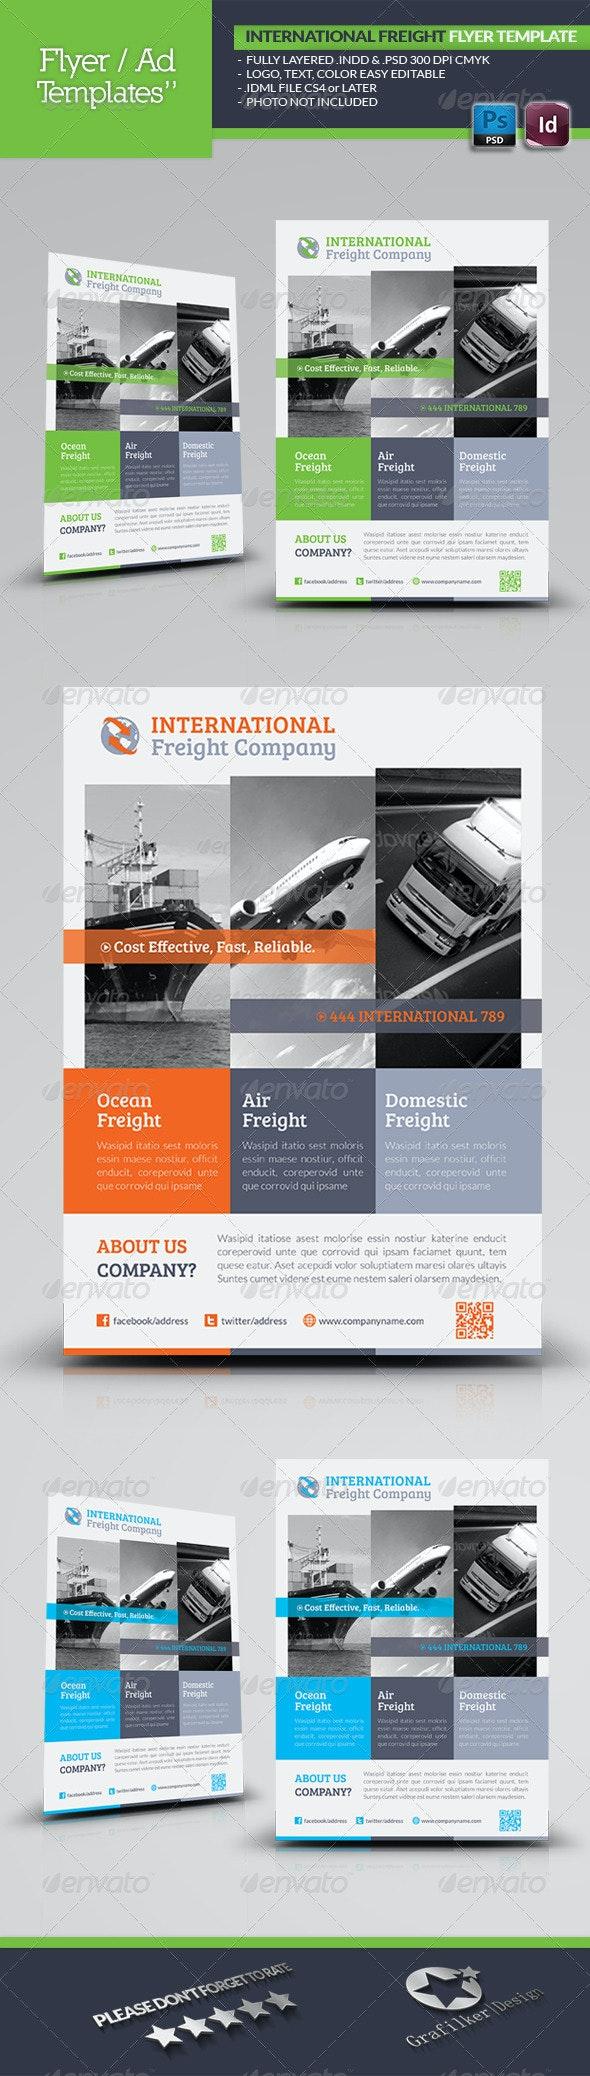 International Freight Flyer Template - Corporate Flyers